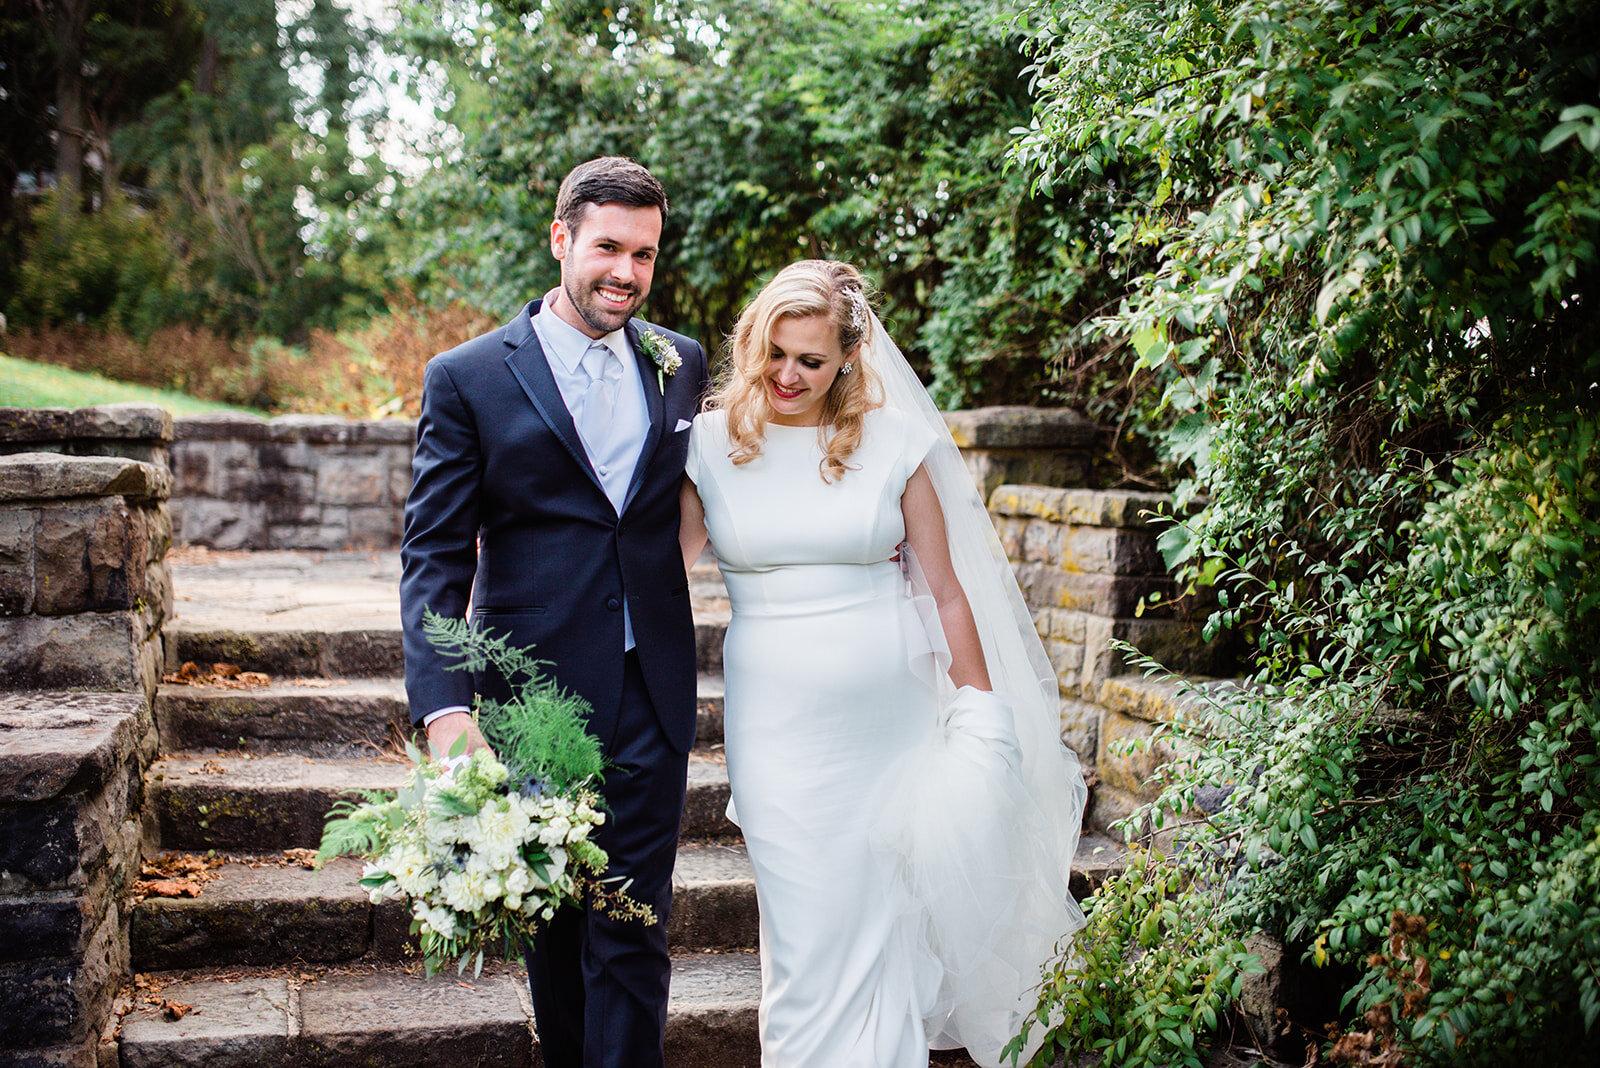 Erika_and_Kevin_Wedding-422.jpg